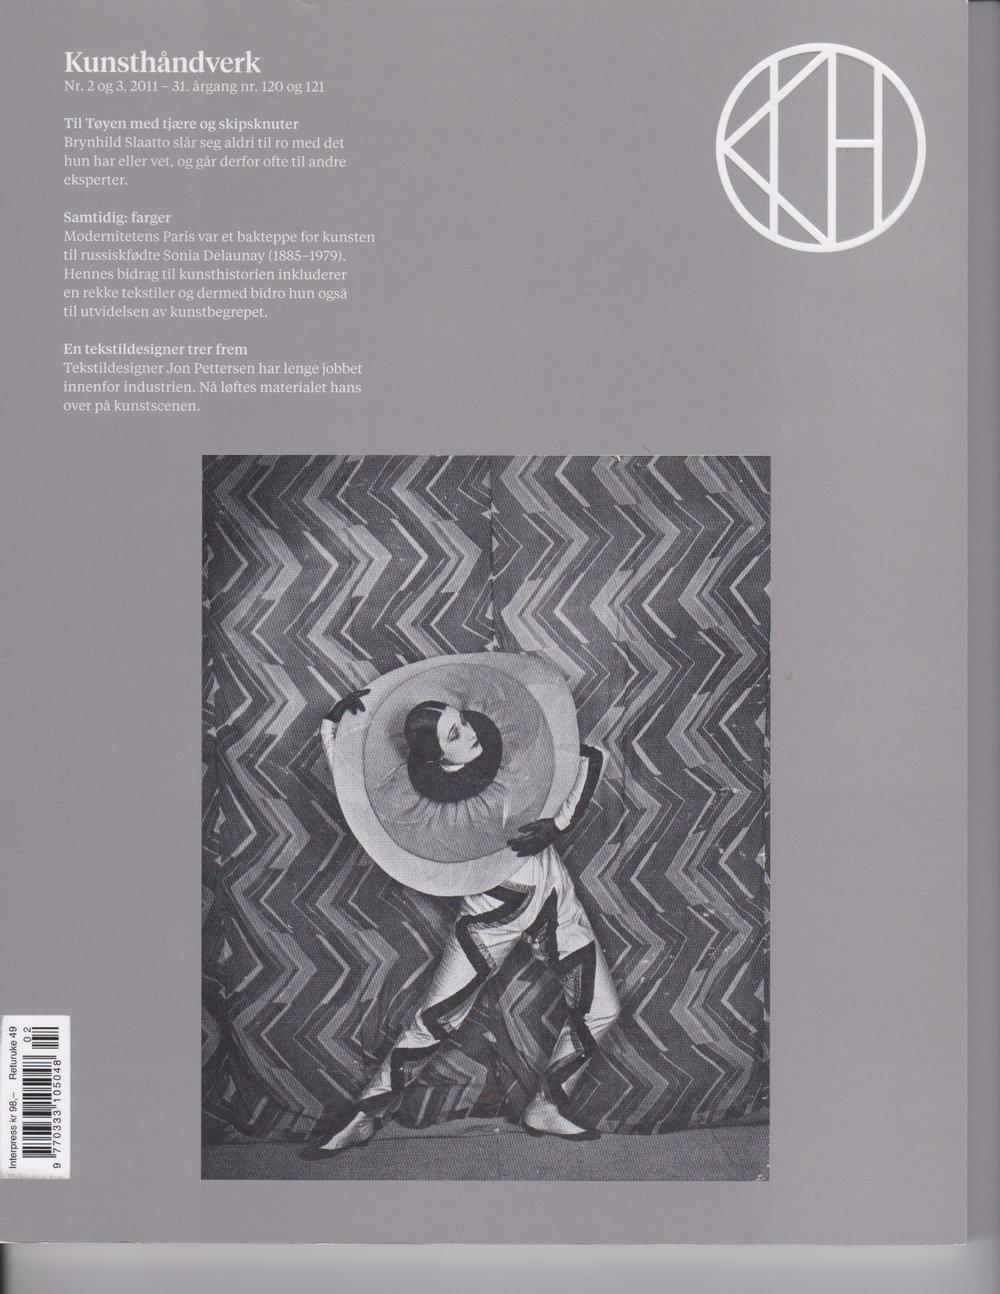 Kunsthandverk cover.jpeg